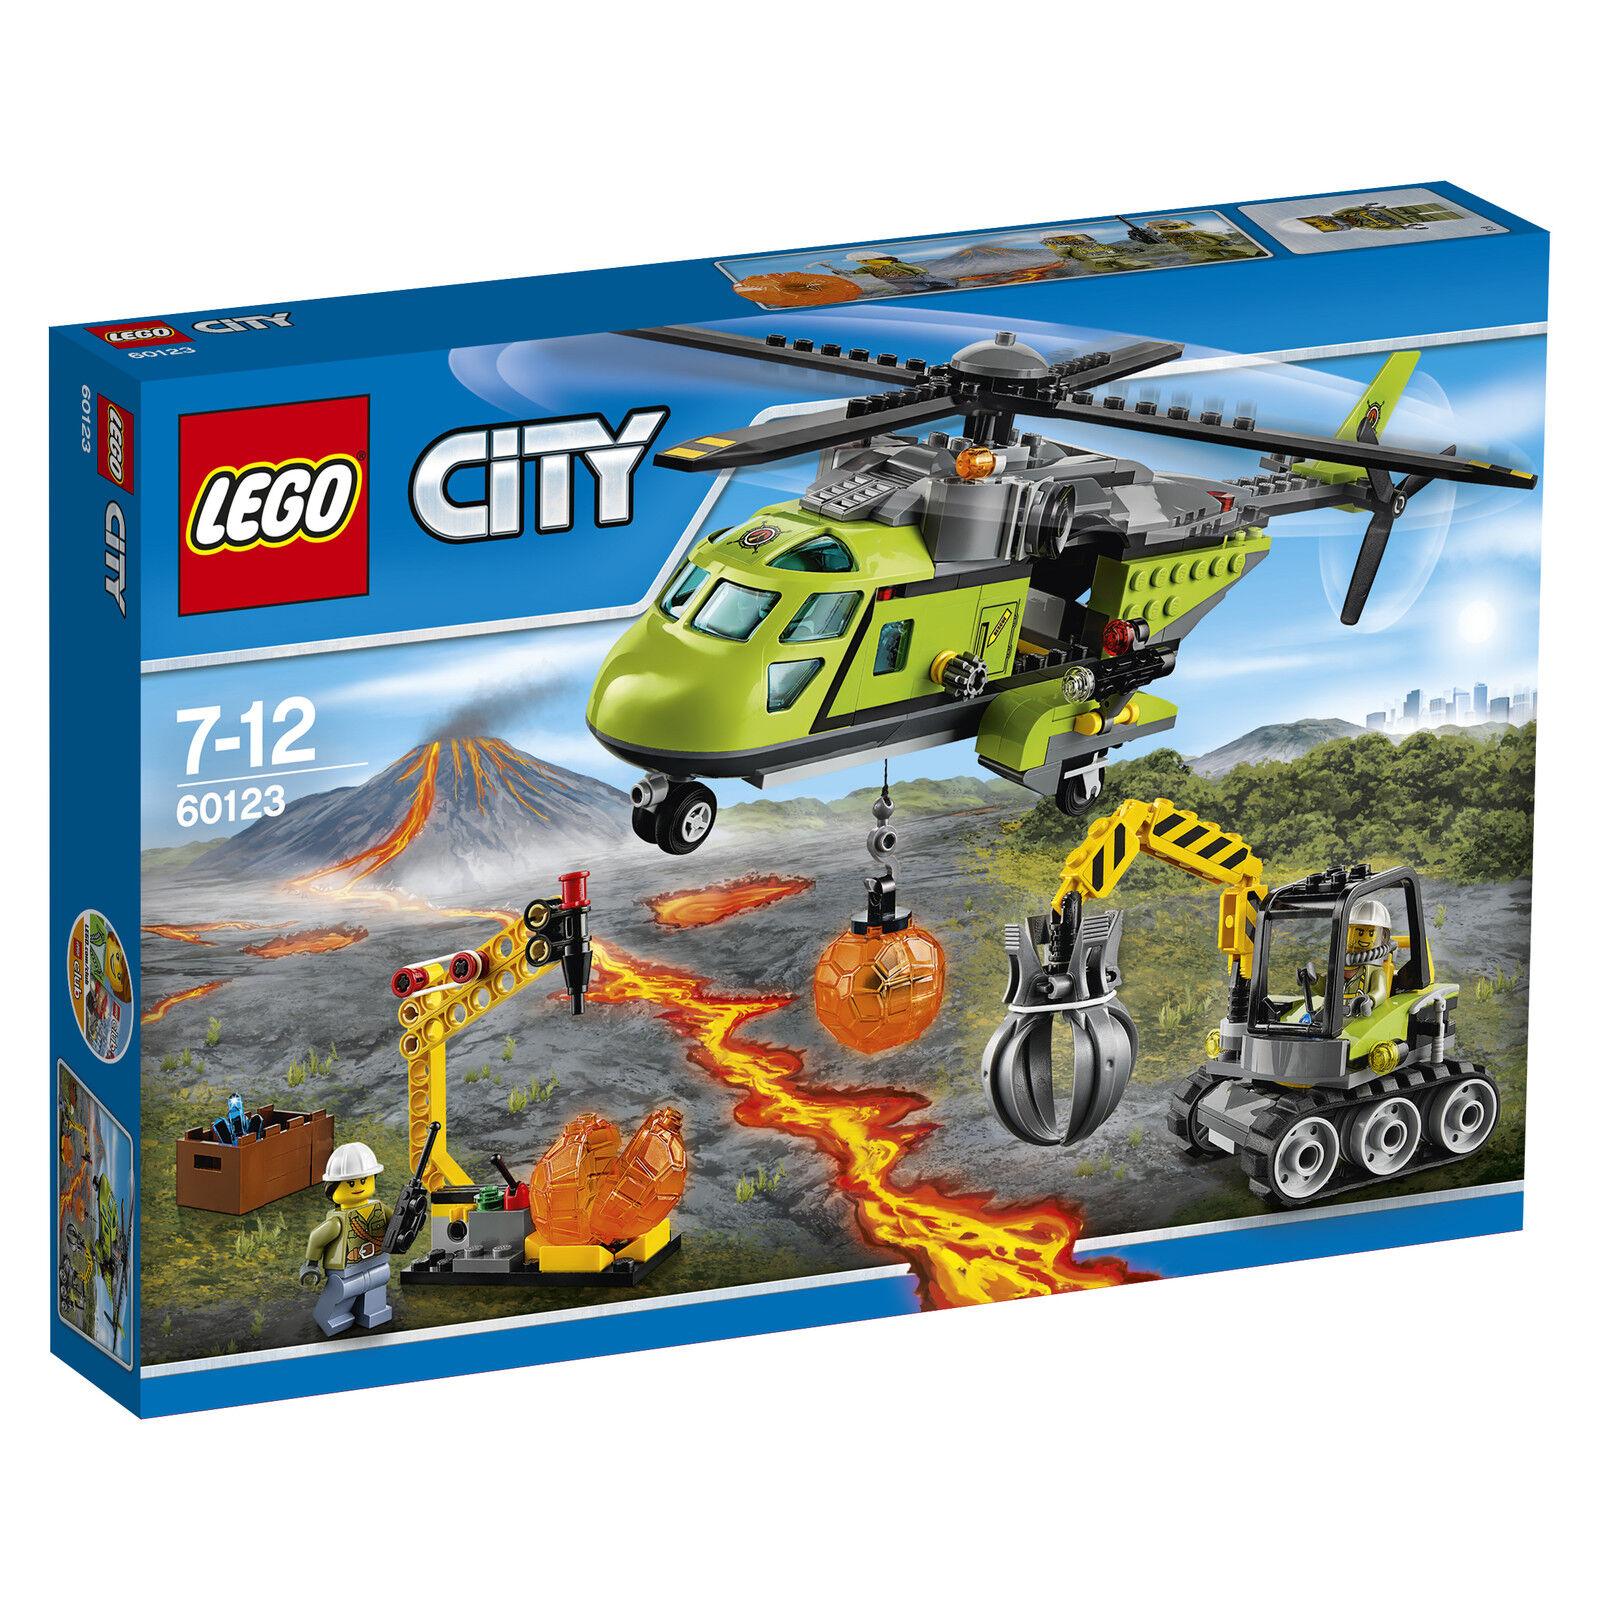 LEGO® City 60123 Vulkan-Versorgungshelikopter NEU_ Volcano Supply Helicopter NEW